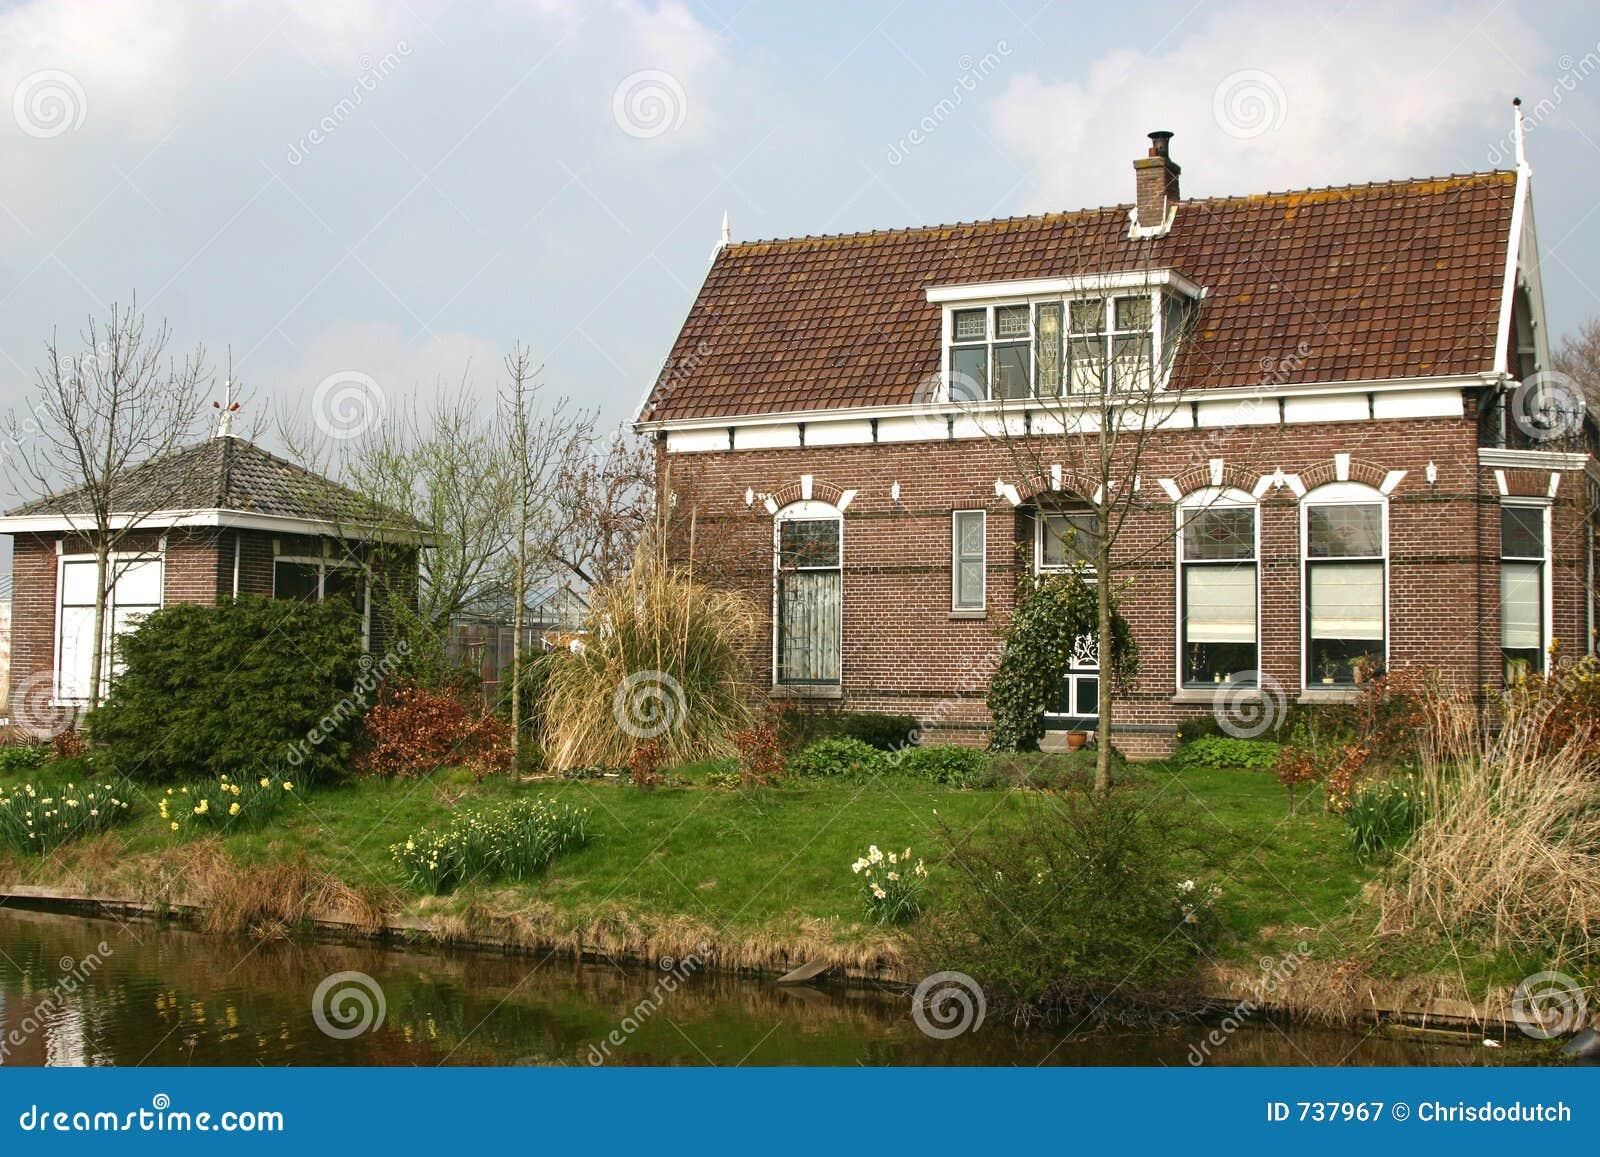 Dutch farm house royalty free stock photography image for Farm house netherlands